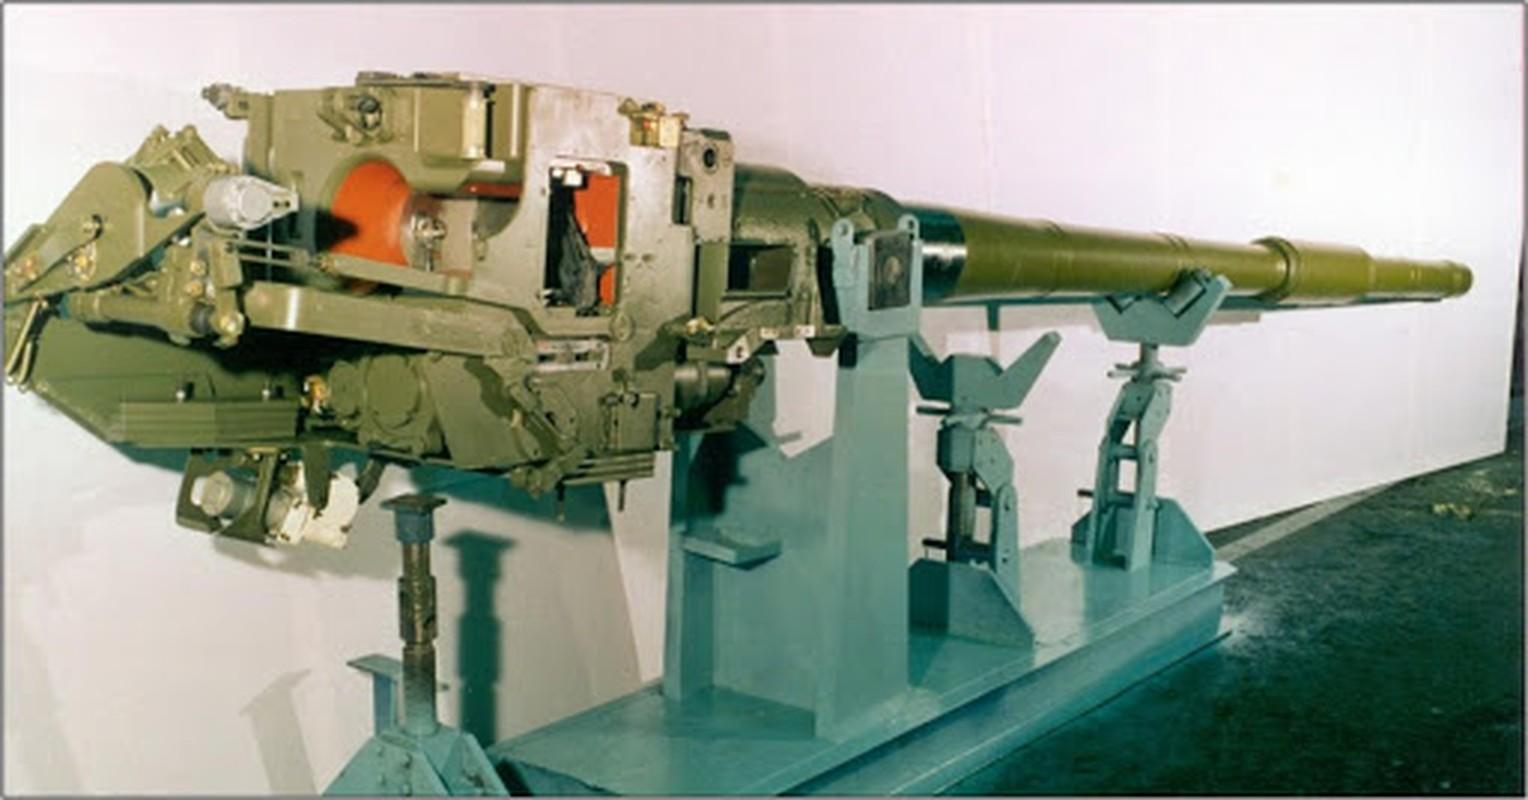 Tai sao T-84 Oplot-M cua Ukraine la xe tang tot nhat chau Au?-Hinh-7